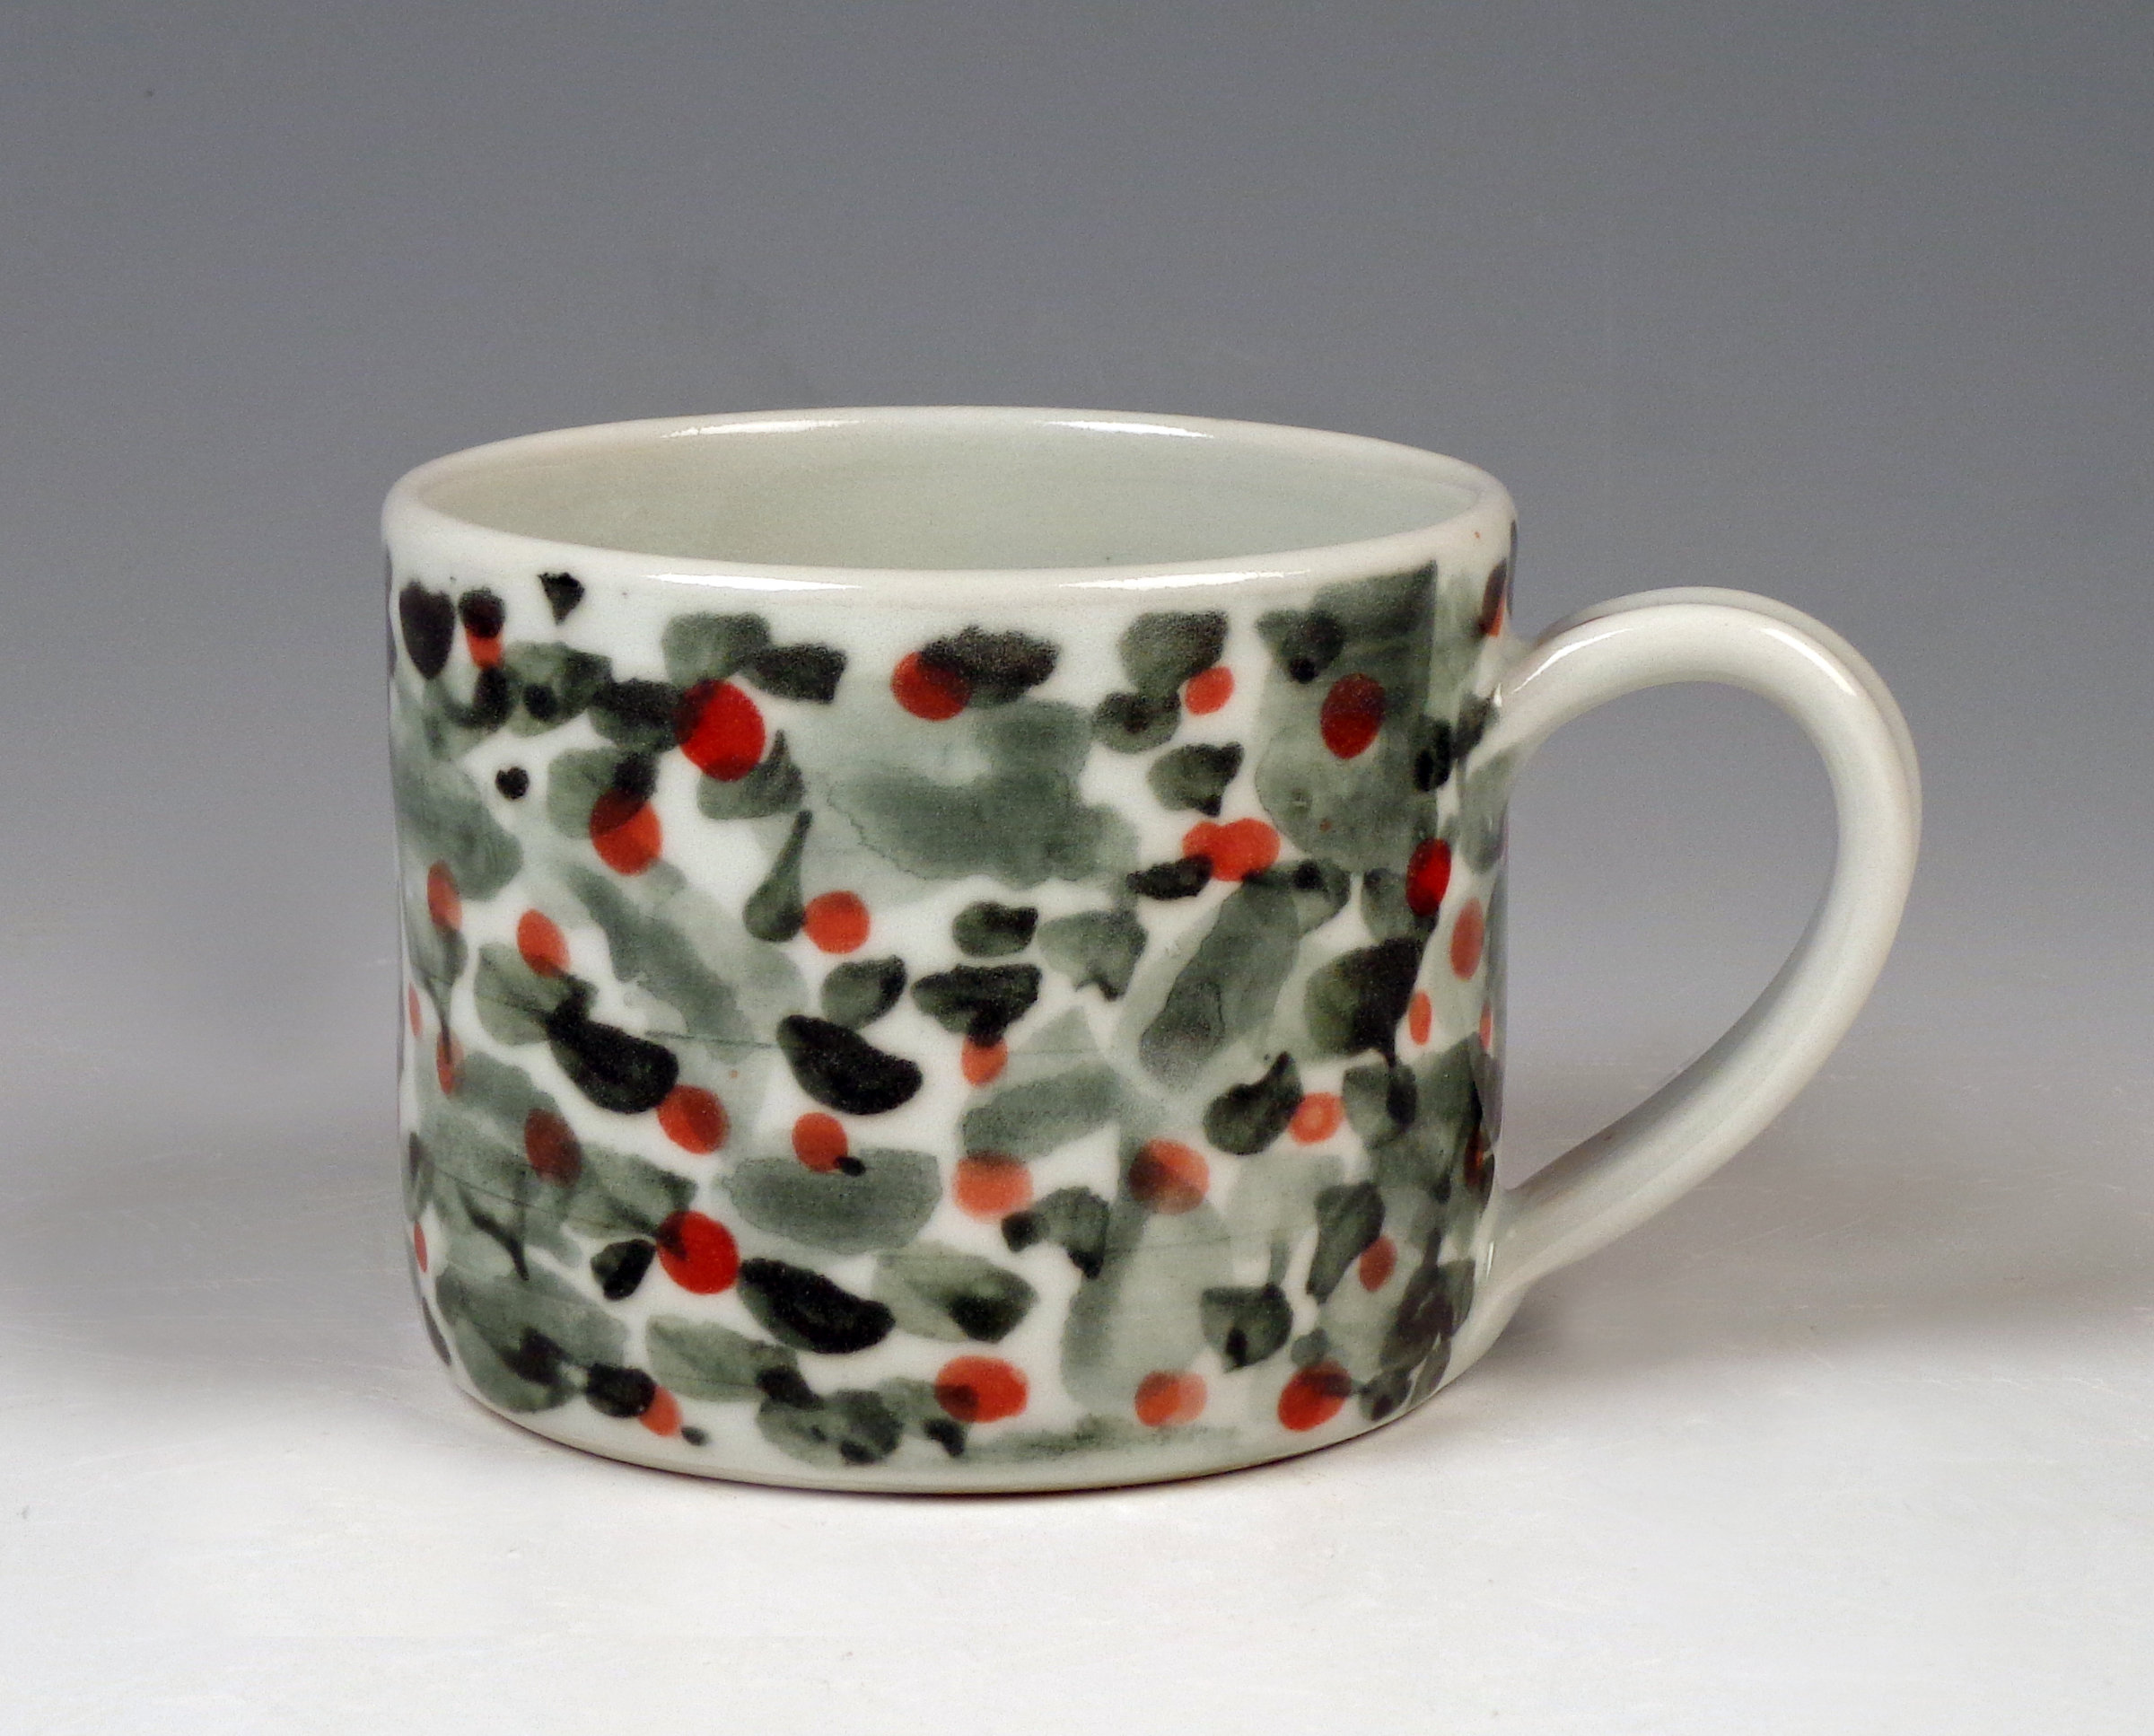 Lin xu linxu studio artist profile artful home for How to paint ceramic mugs at home